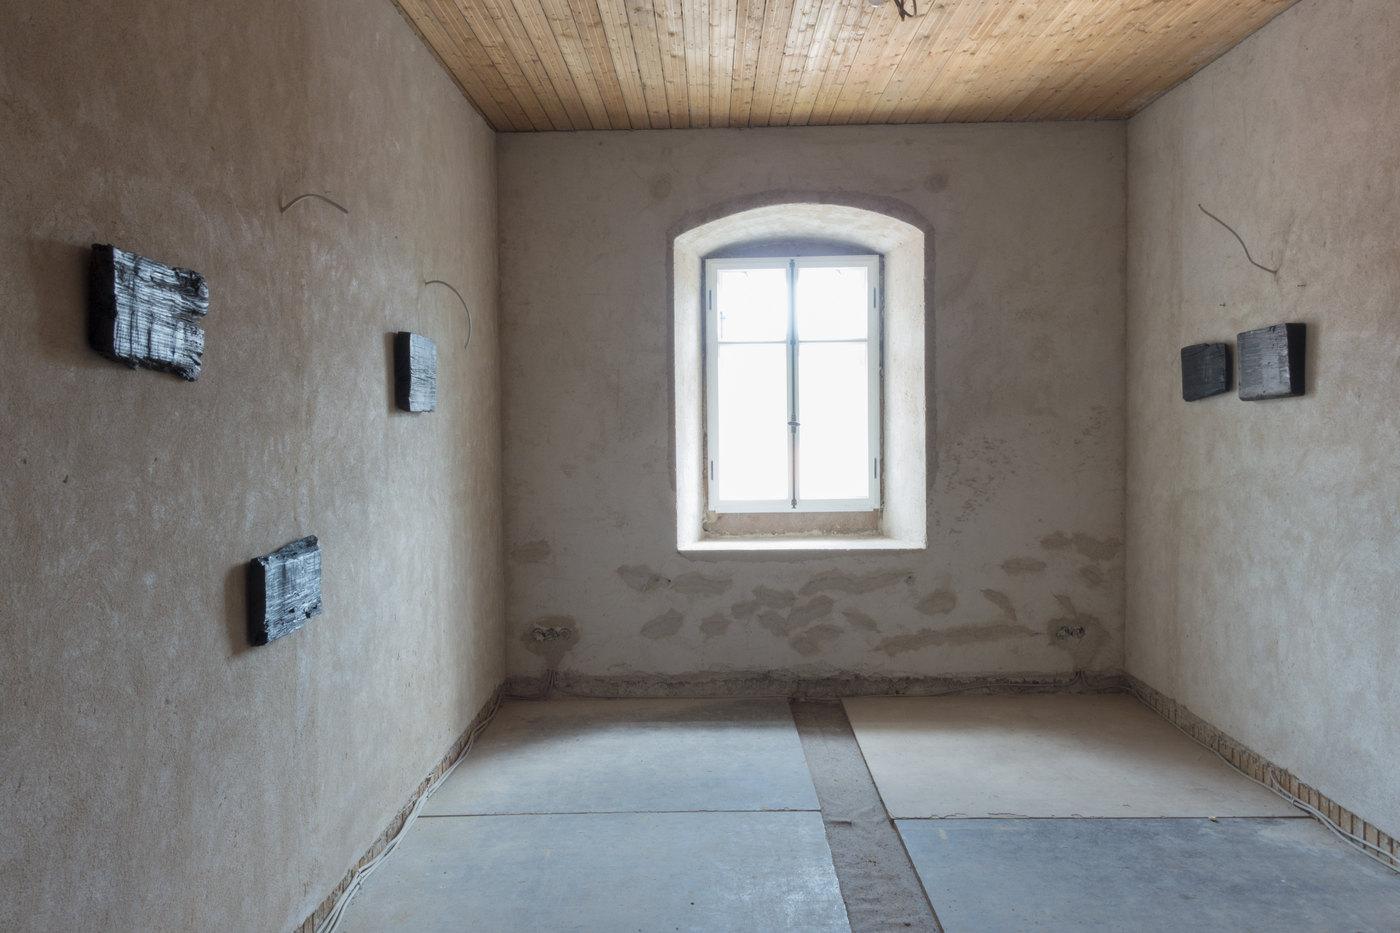 Kunstverein Wiesen_KuWi_Forward to History_Jan Kiefer & Robert Brambora_2016_RB_Room3a